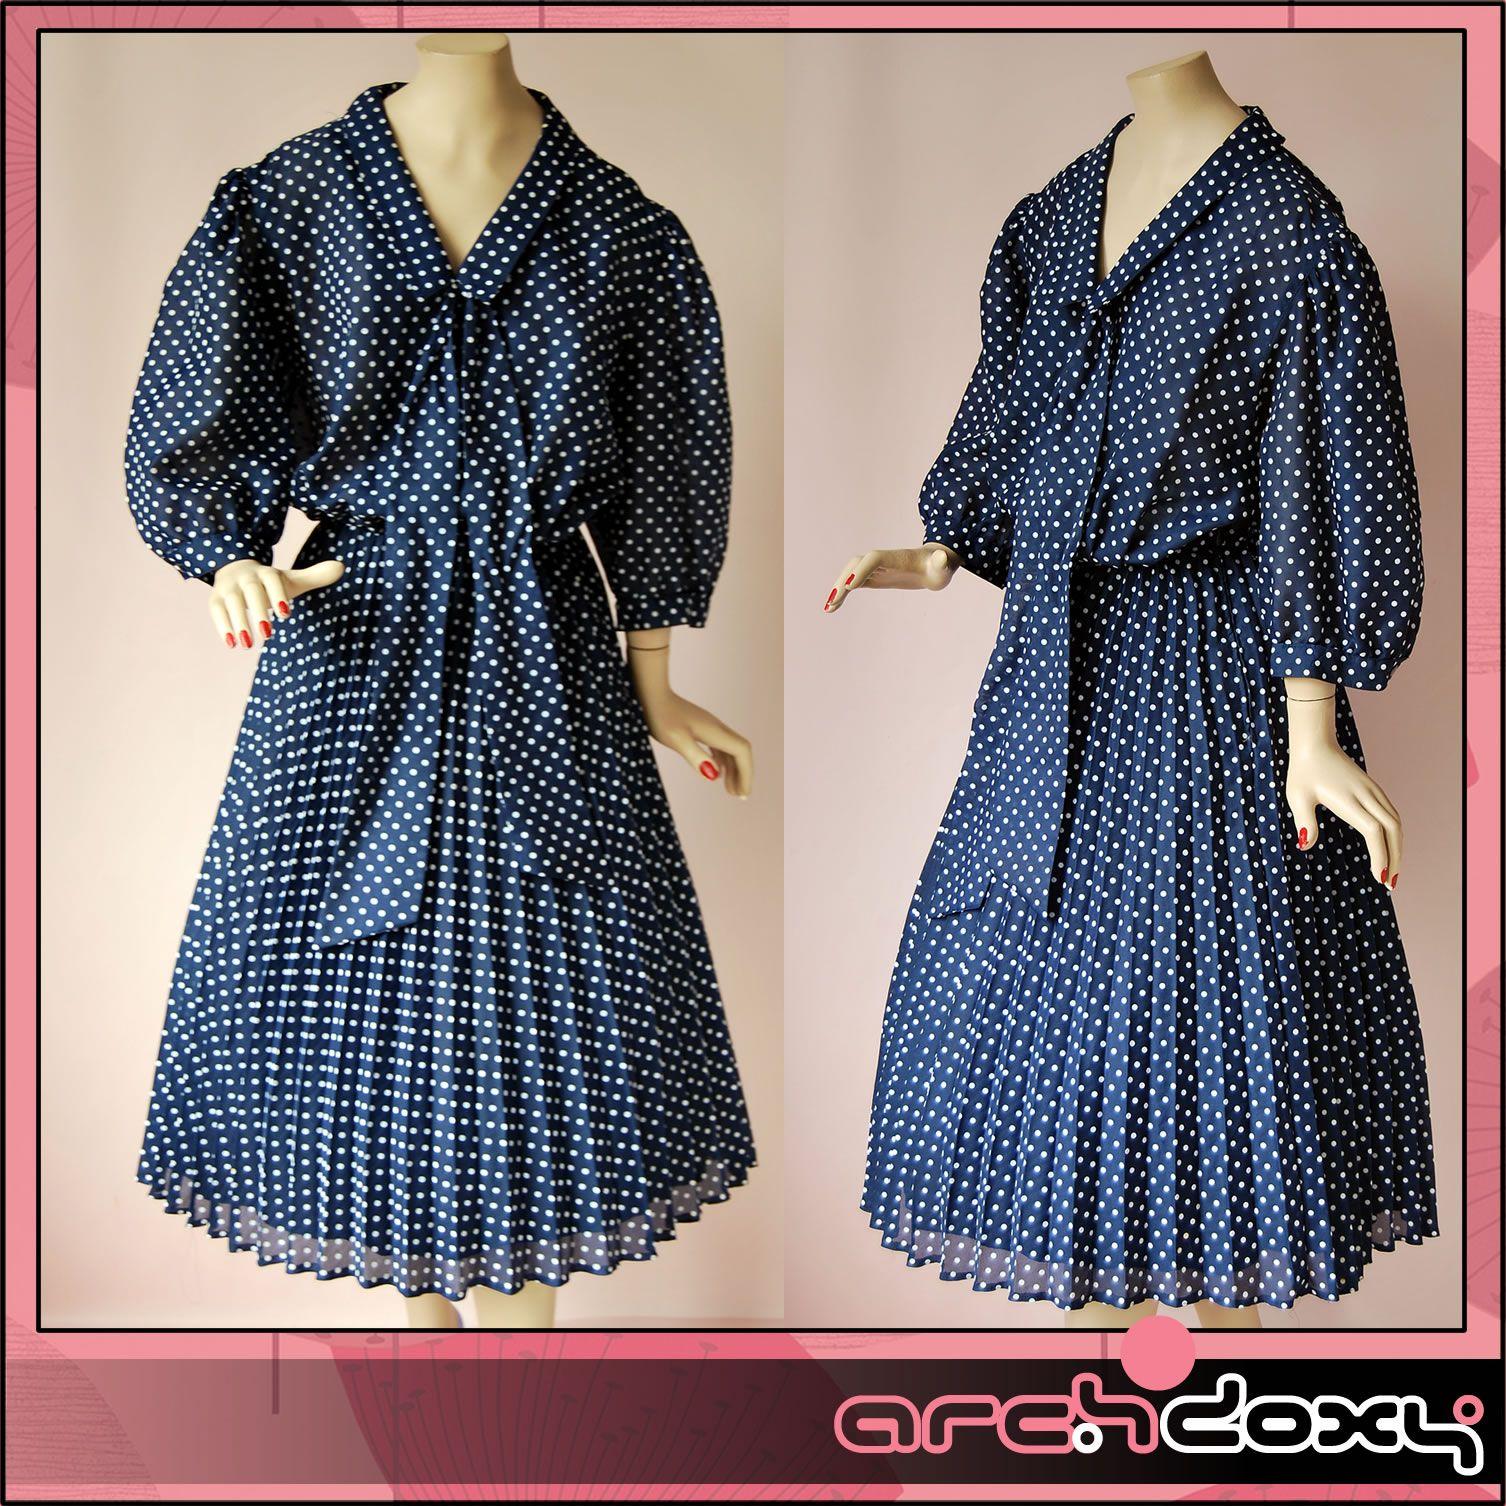 Vintage 80s Sailor Tie Plus Size Polka Dot Dress #vintagedress #retro #vintage  http://www.ebay.co.uk/itm/Vintage-1980s-Sailor-Tie-Plus-Size-Polka-Dot-Navy-Pleated-New-Wave-Dress-UK20-/371656273794